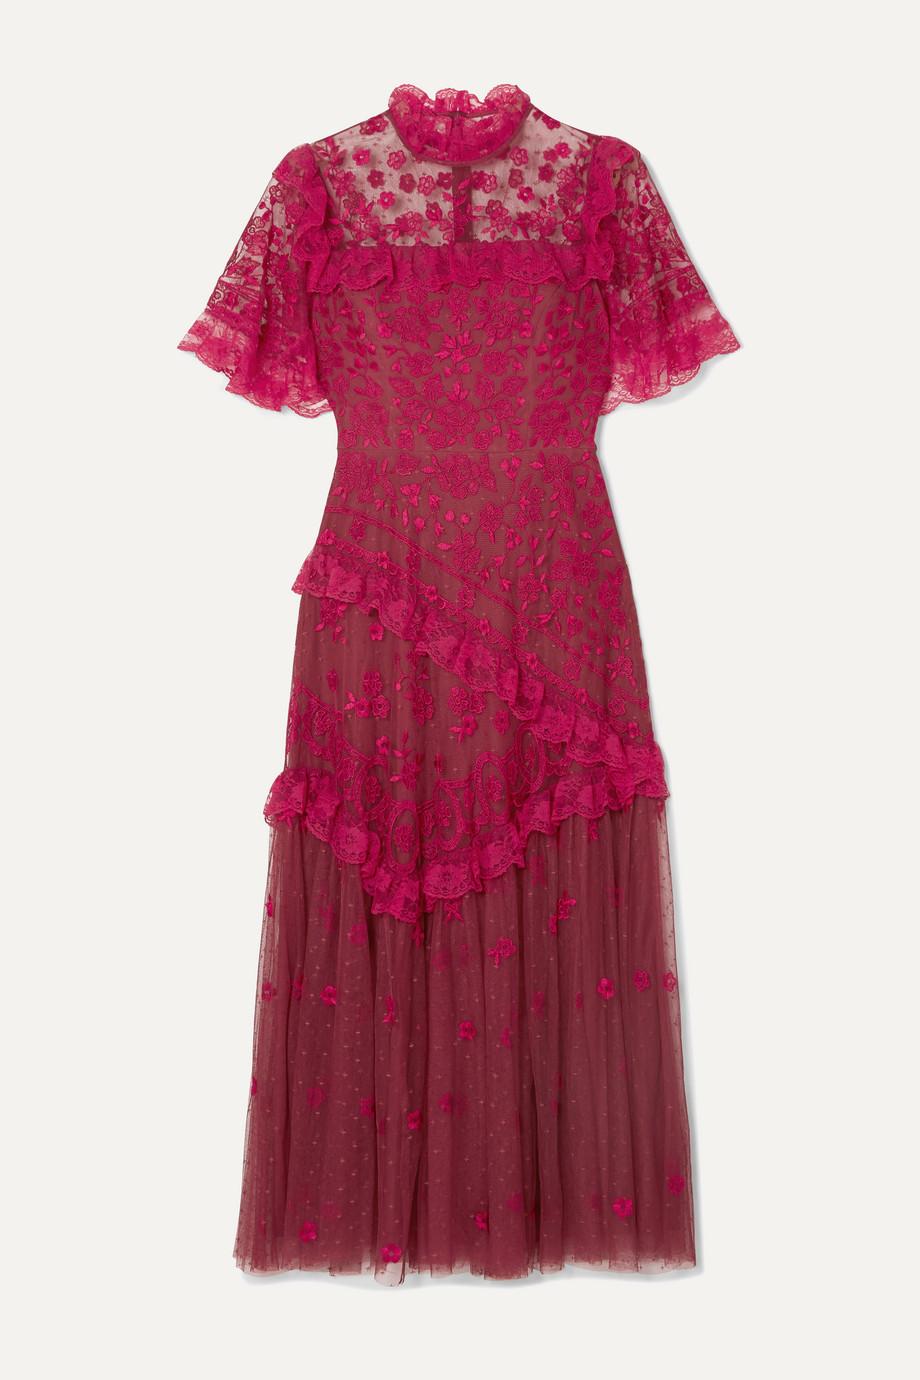 Needle & Thread Elsa Ballerina ruffled lace-trimmed embroidered tulle midi dress